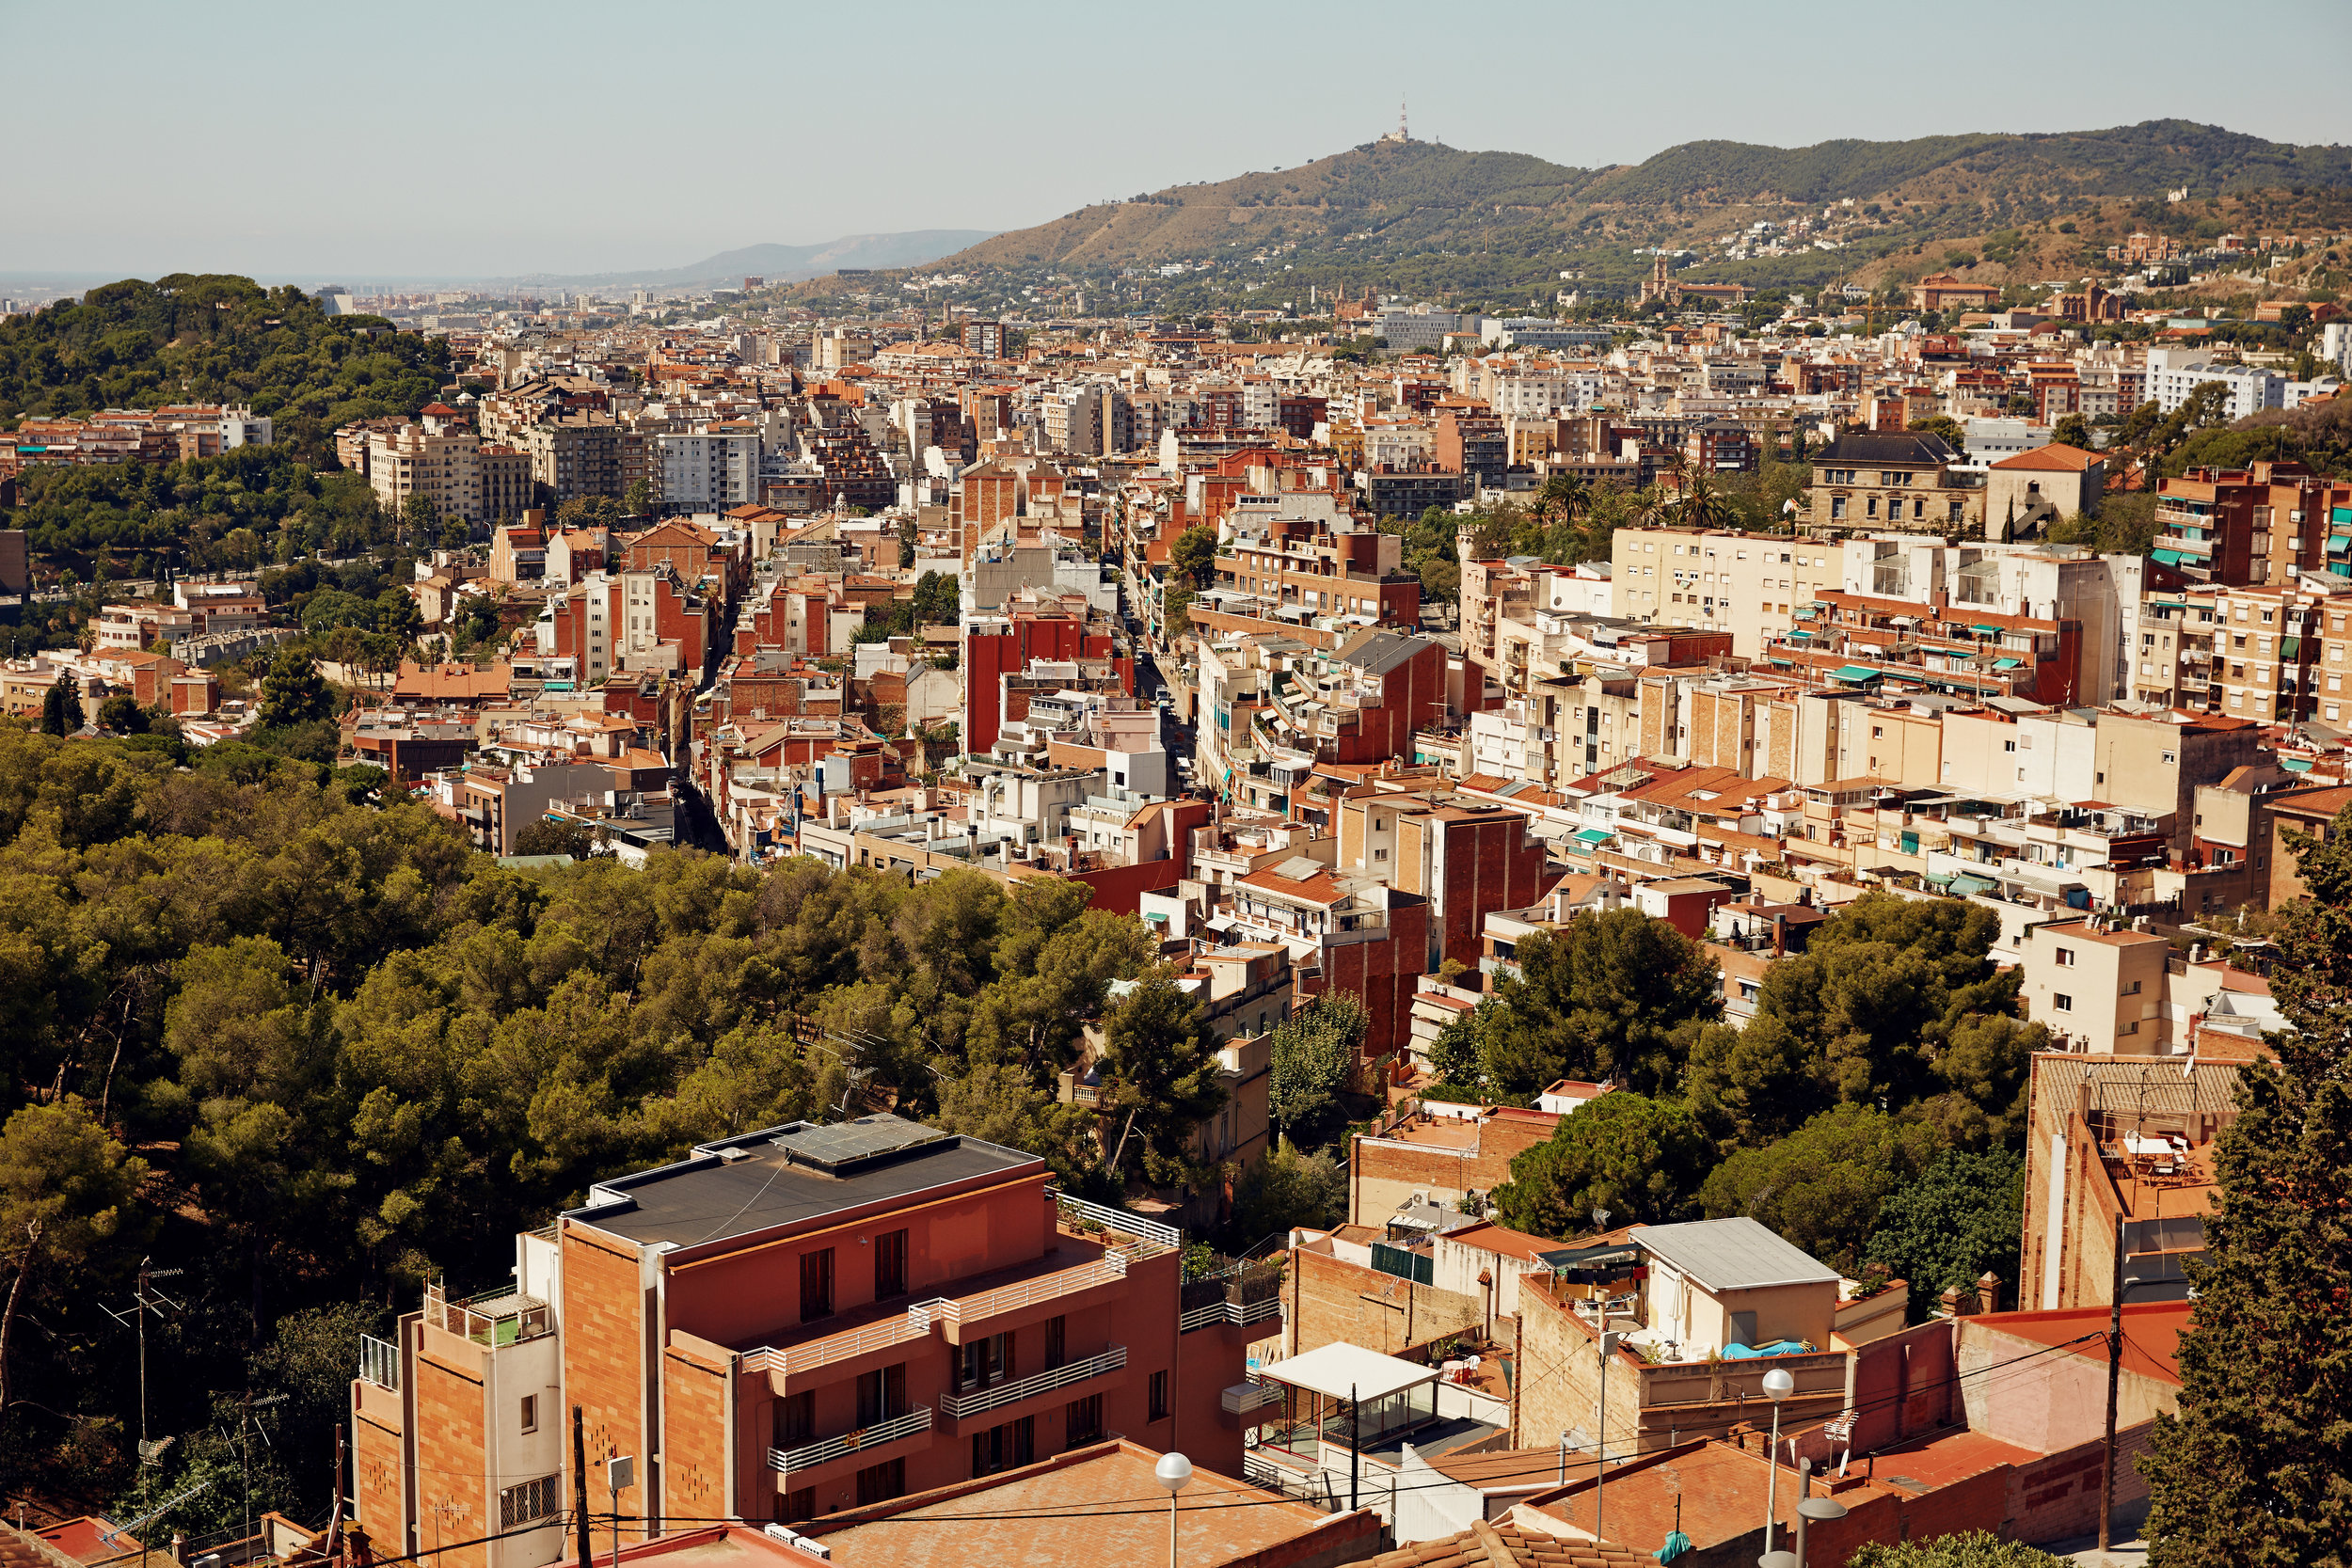 Barcelona_2017_AdamDillon_4F8A2587.jpg